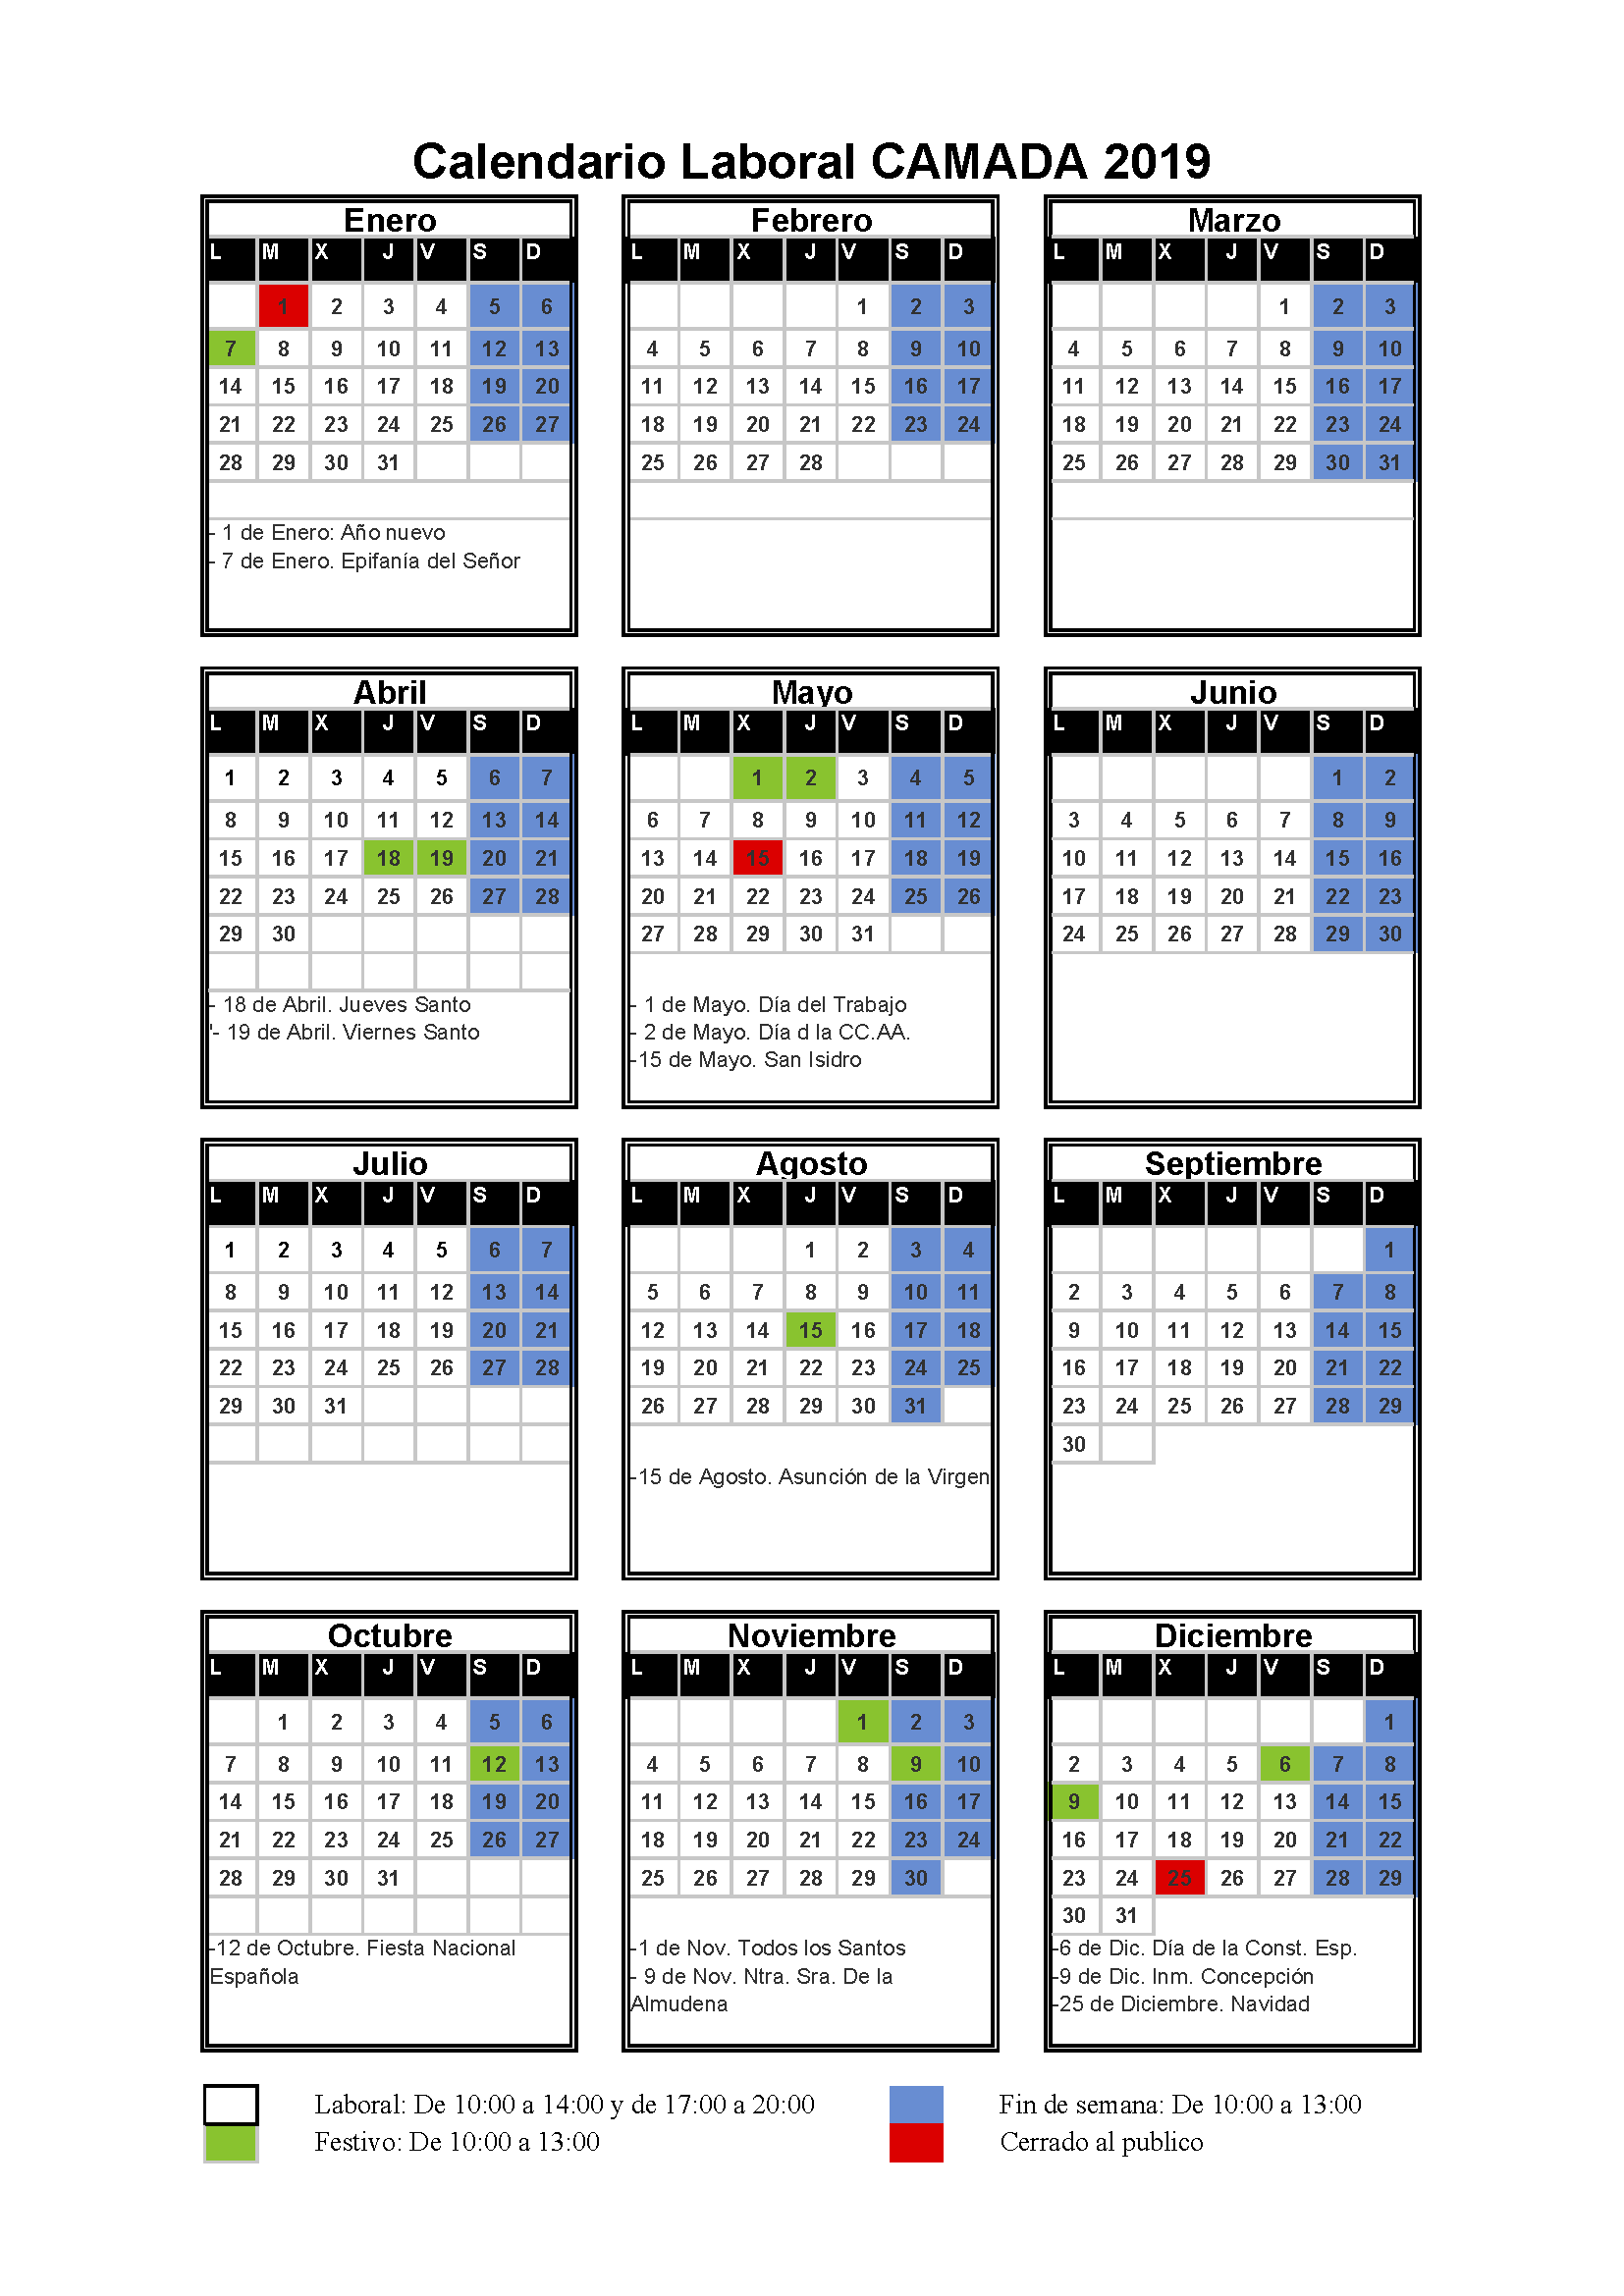 Calendario laboral Camada 2019